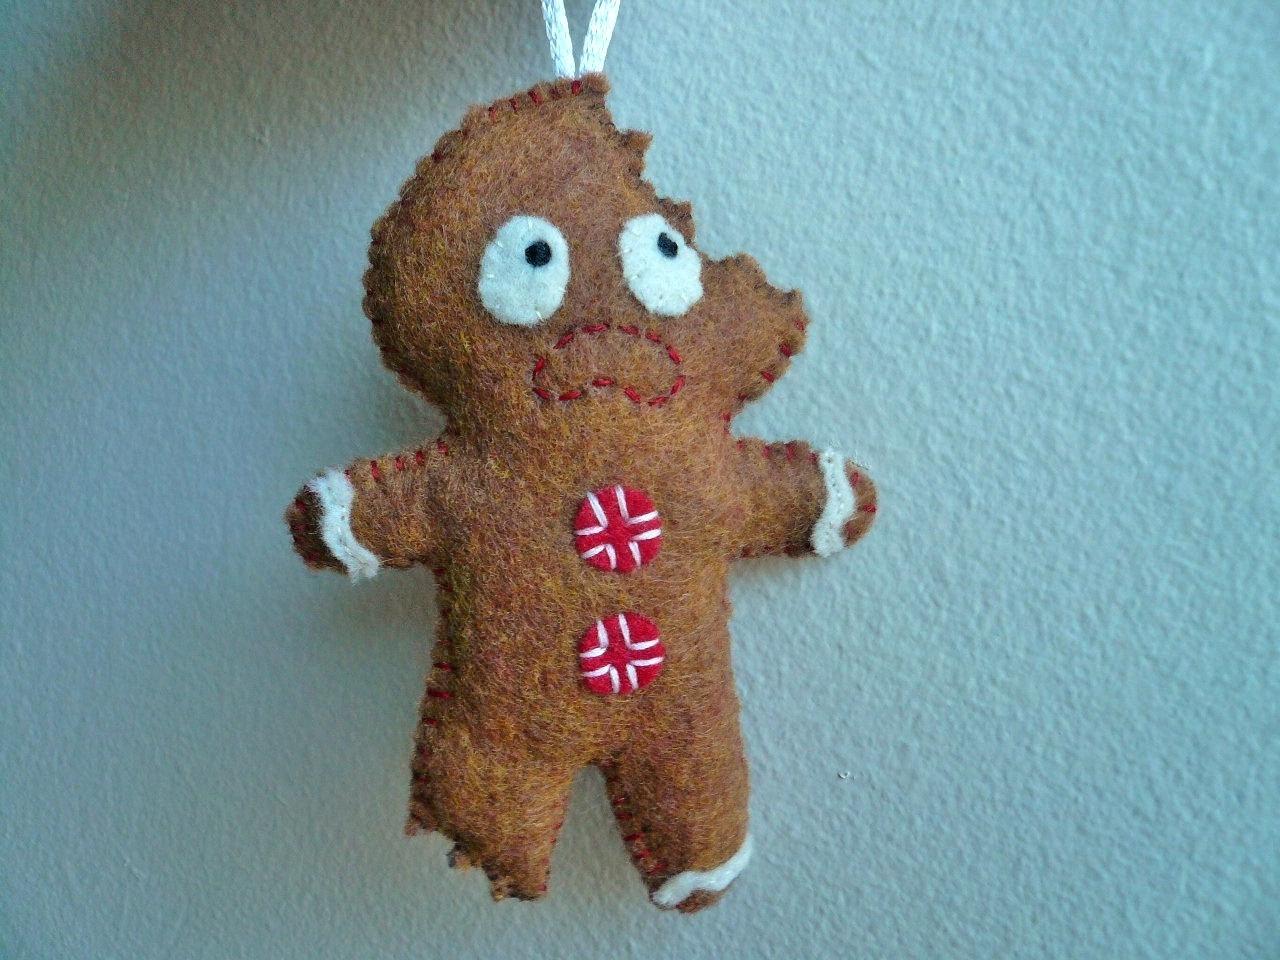 Felt Gingerbread Man Craft